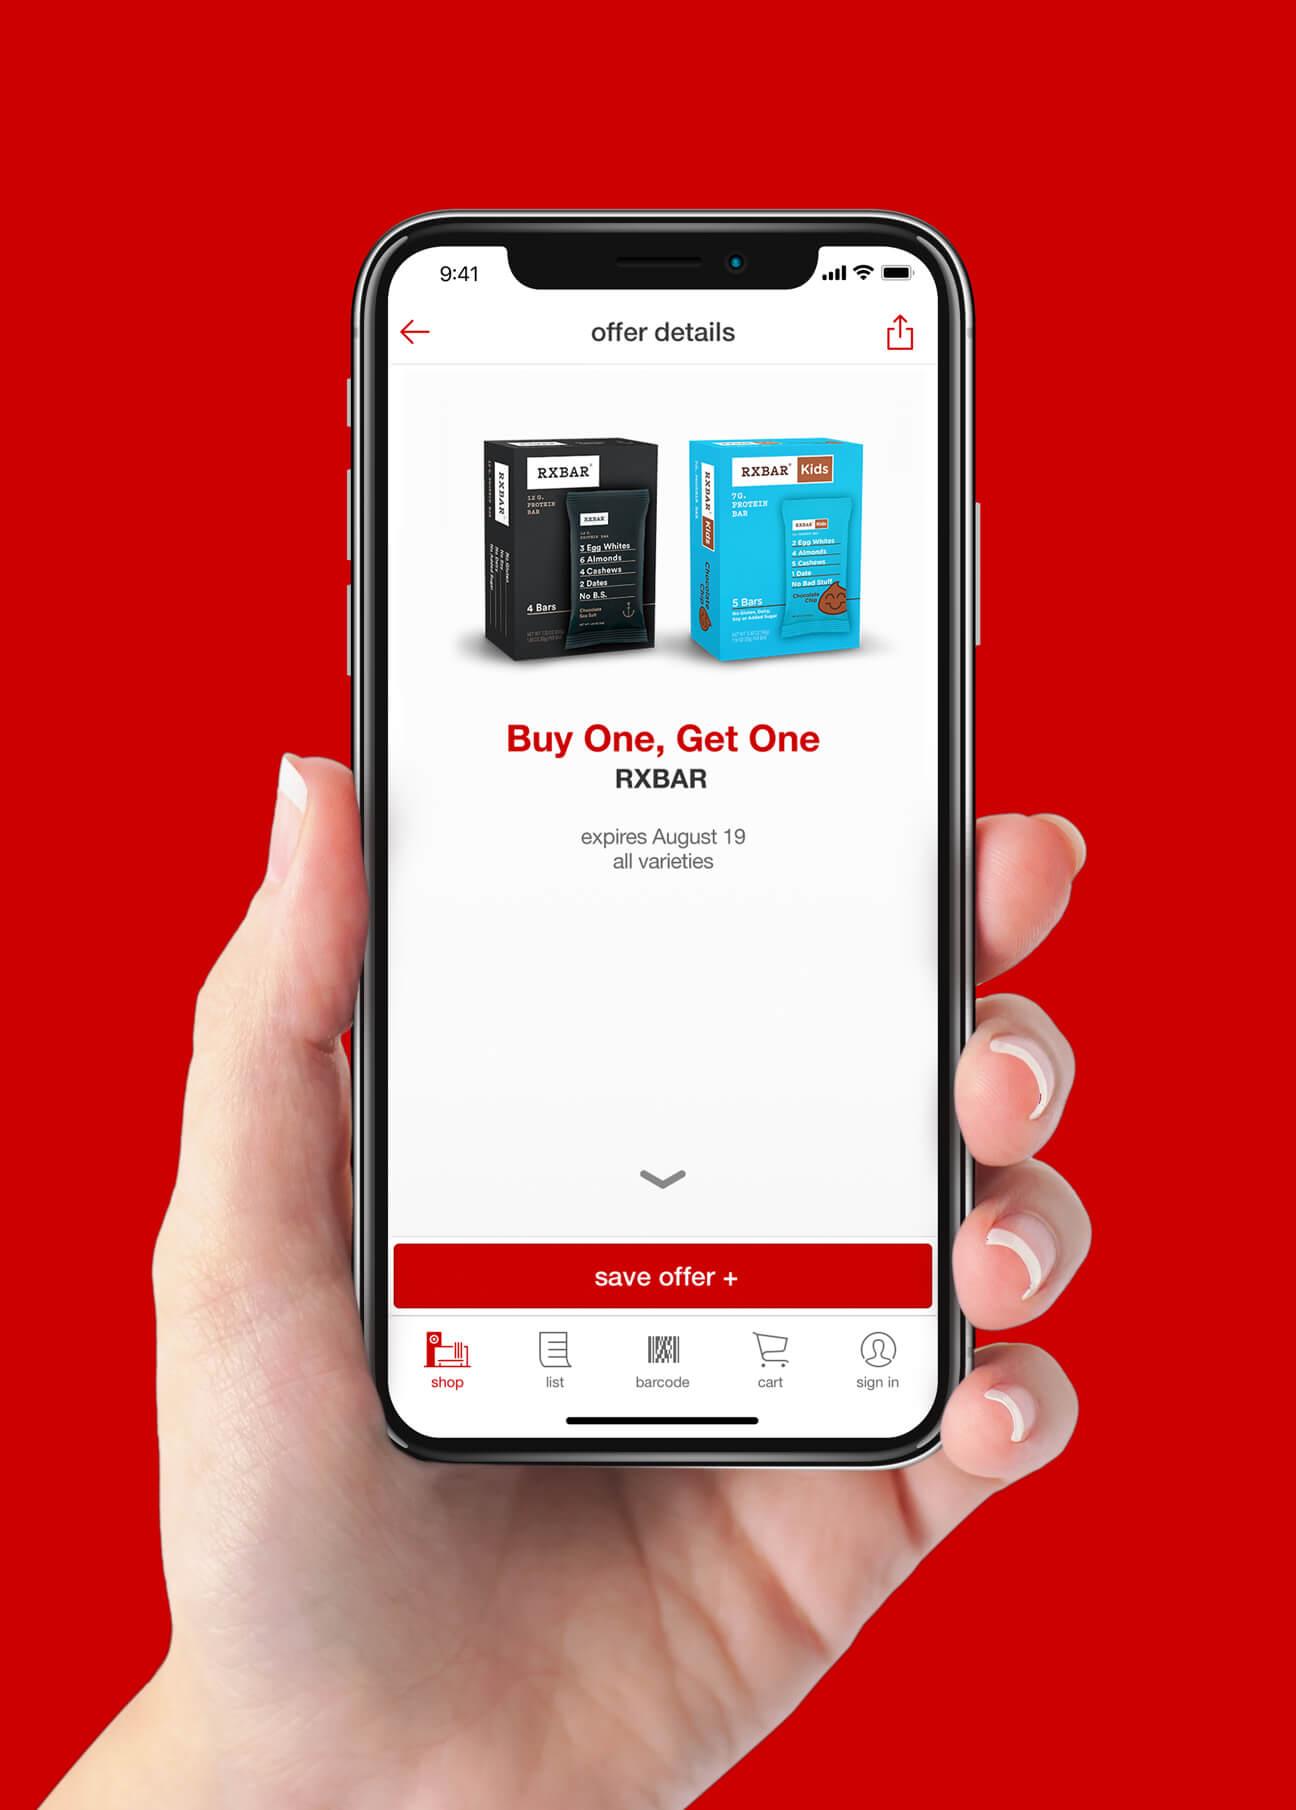 RXBAR Target Mobile Ad